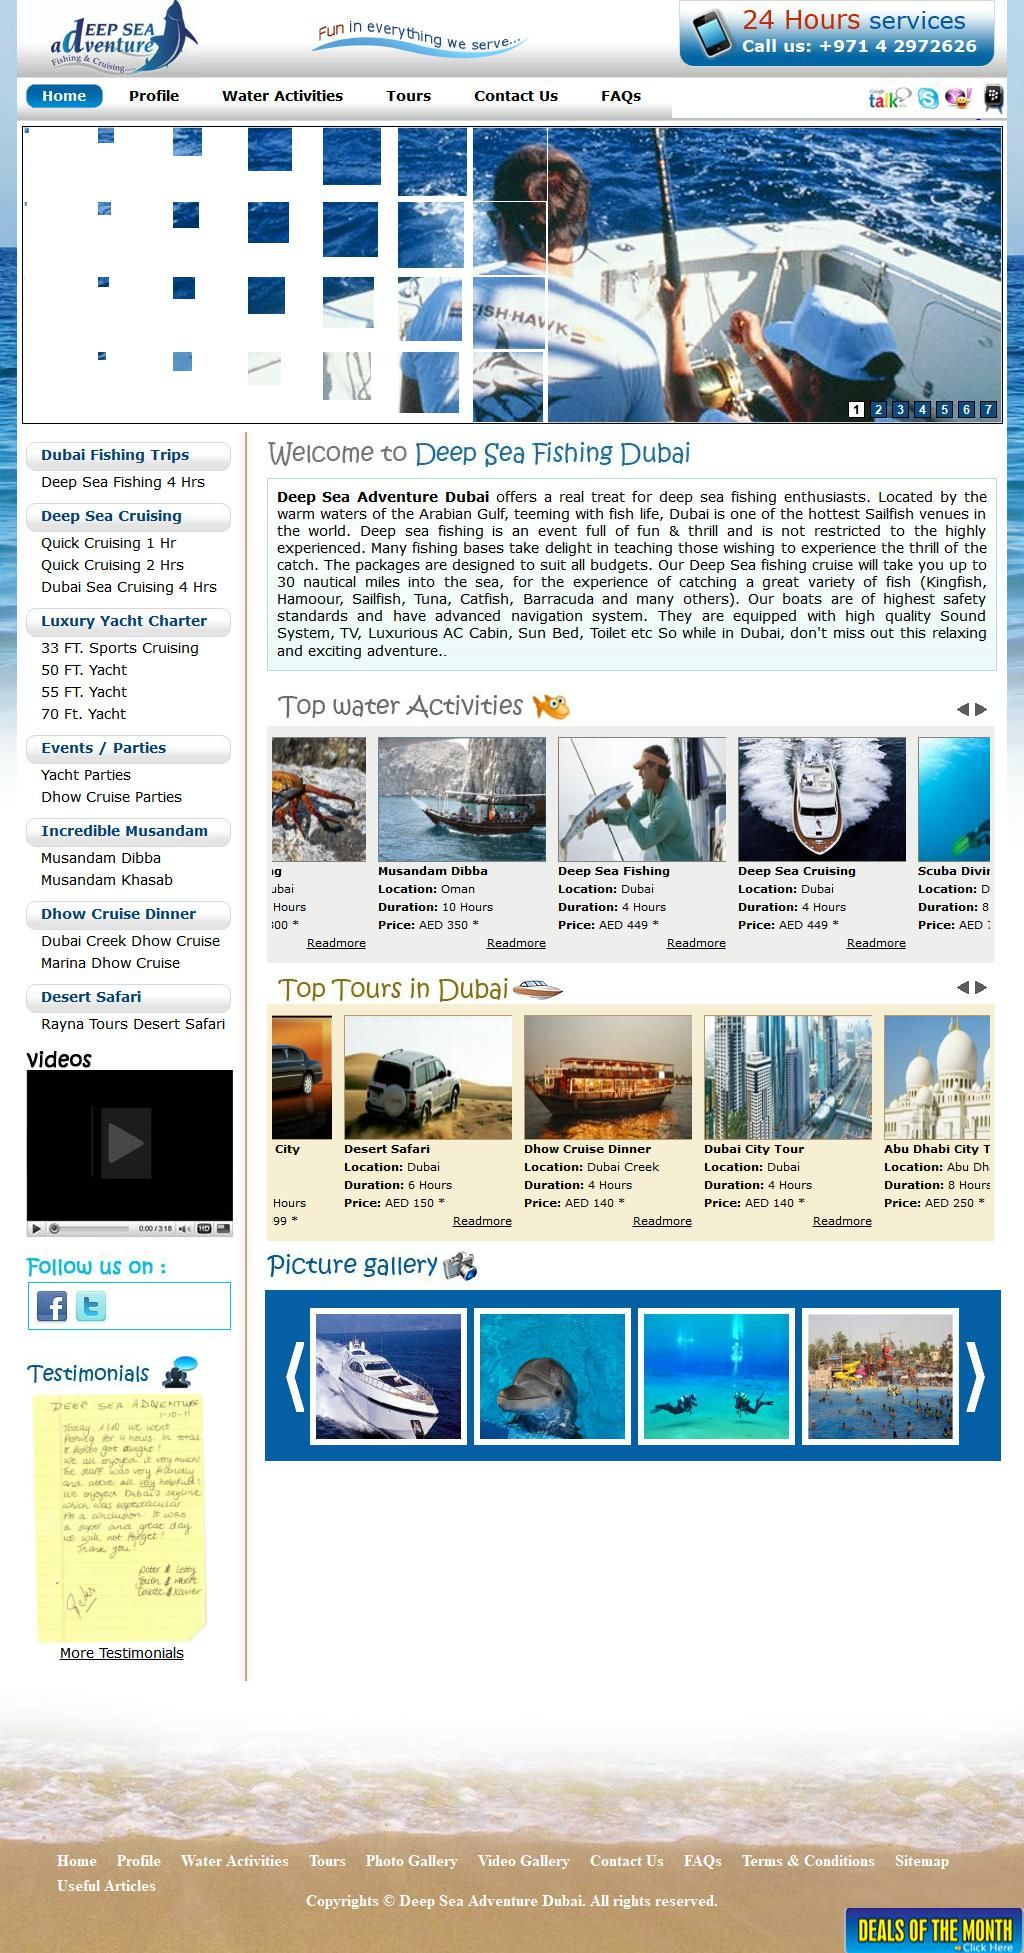 Deep Sea Adventure Water Sport & Tours Company Al Kazim Building